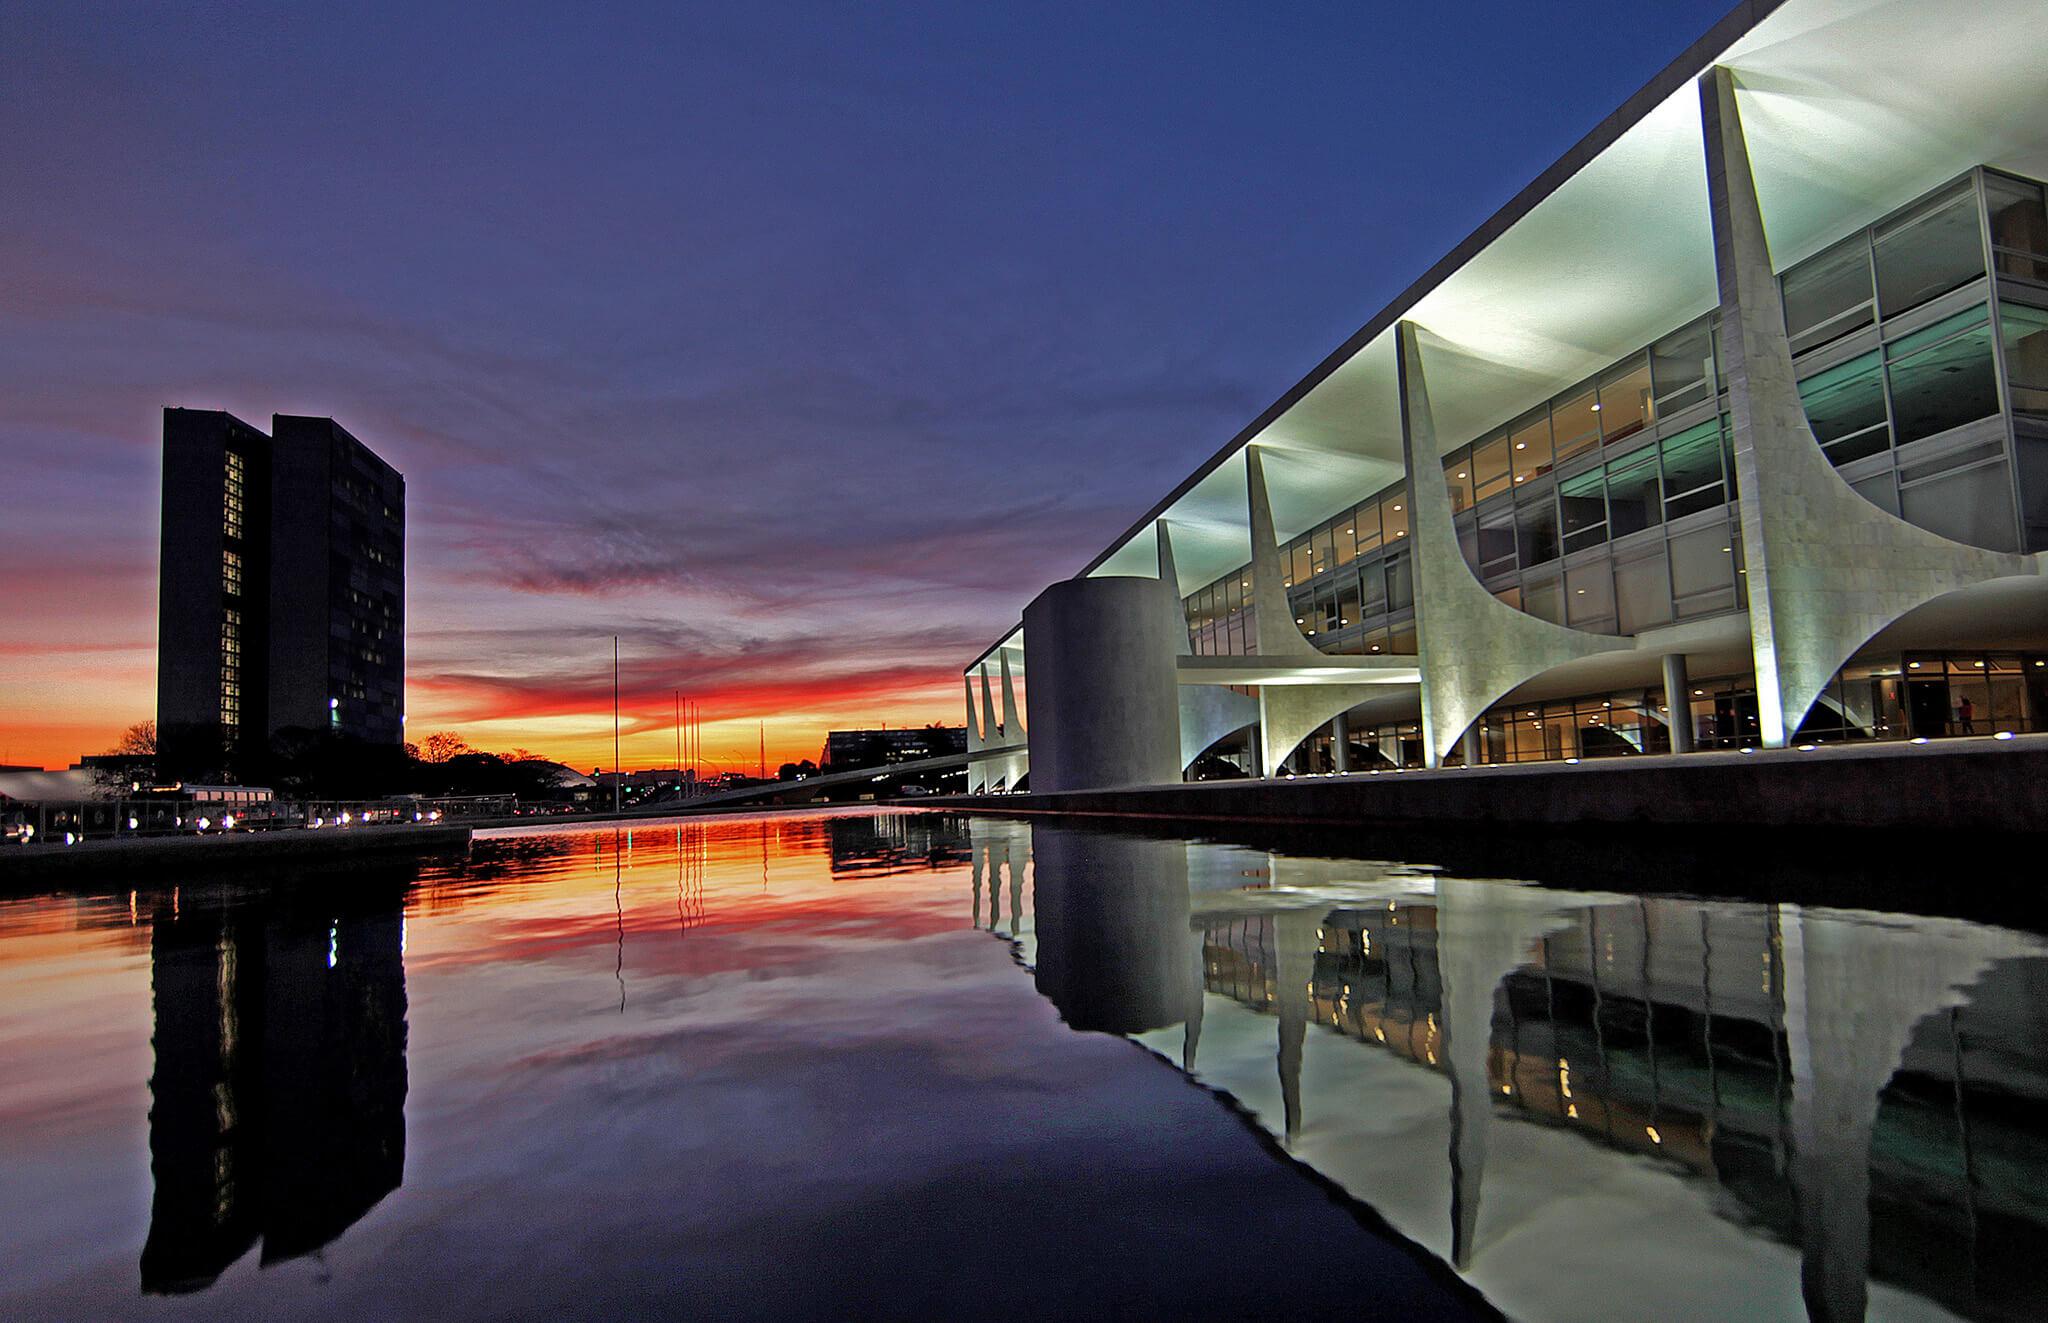 Image de Brasilia. Contenu des freins et contrepoids